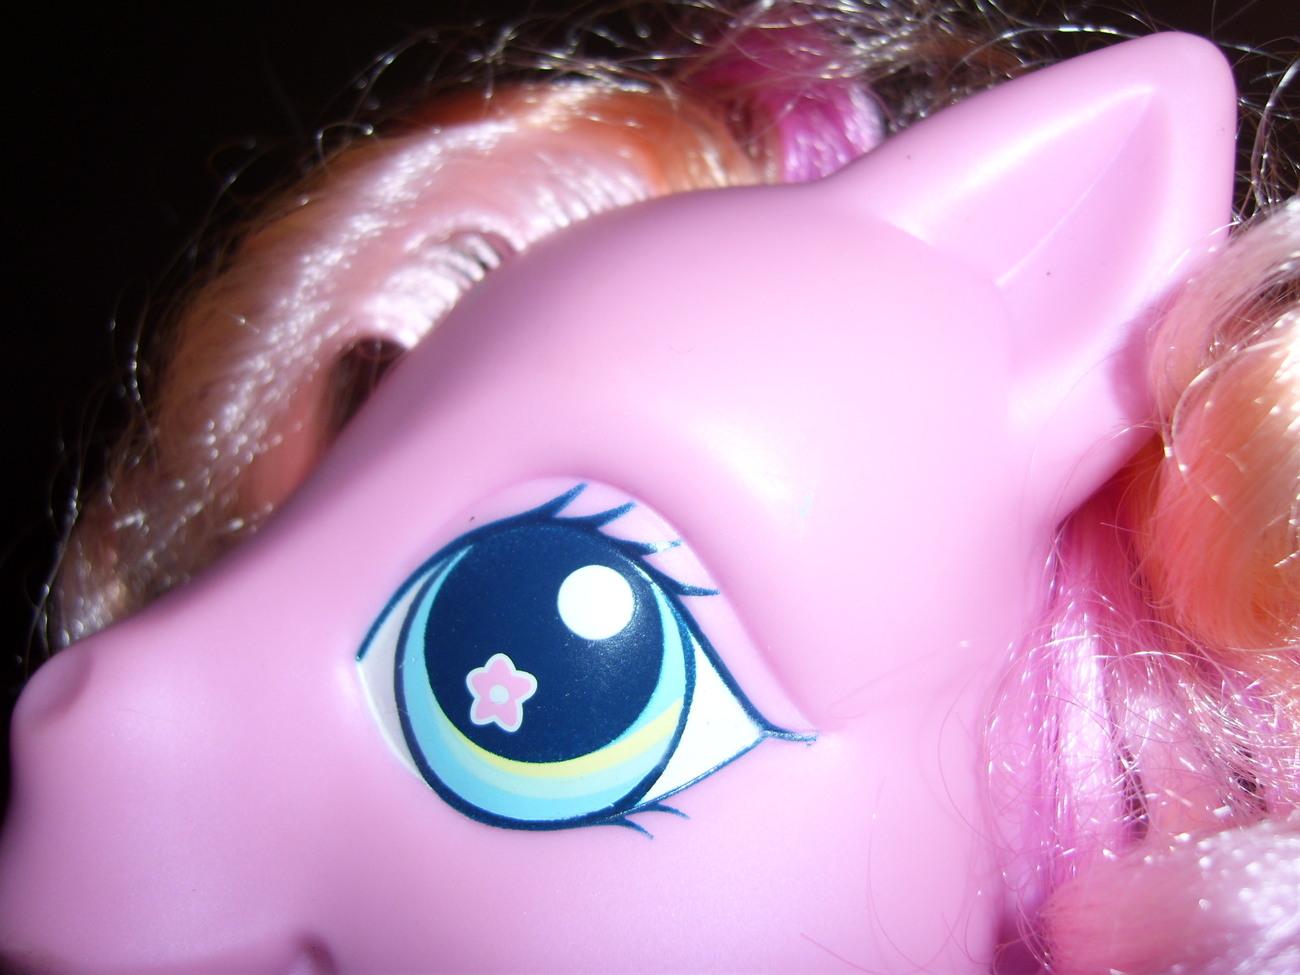 My Little Pony G3 So Soft Baby Rose Blossom plush